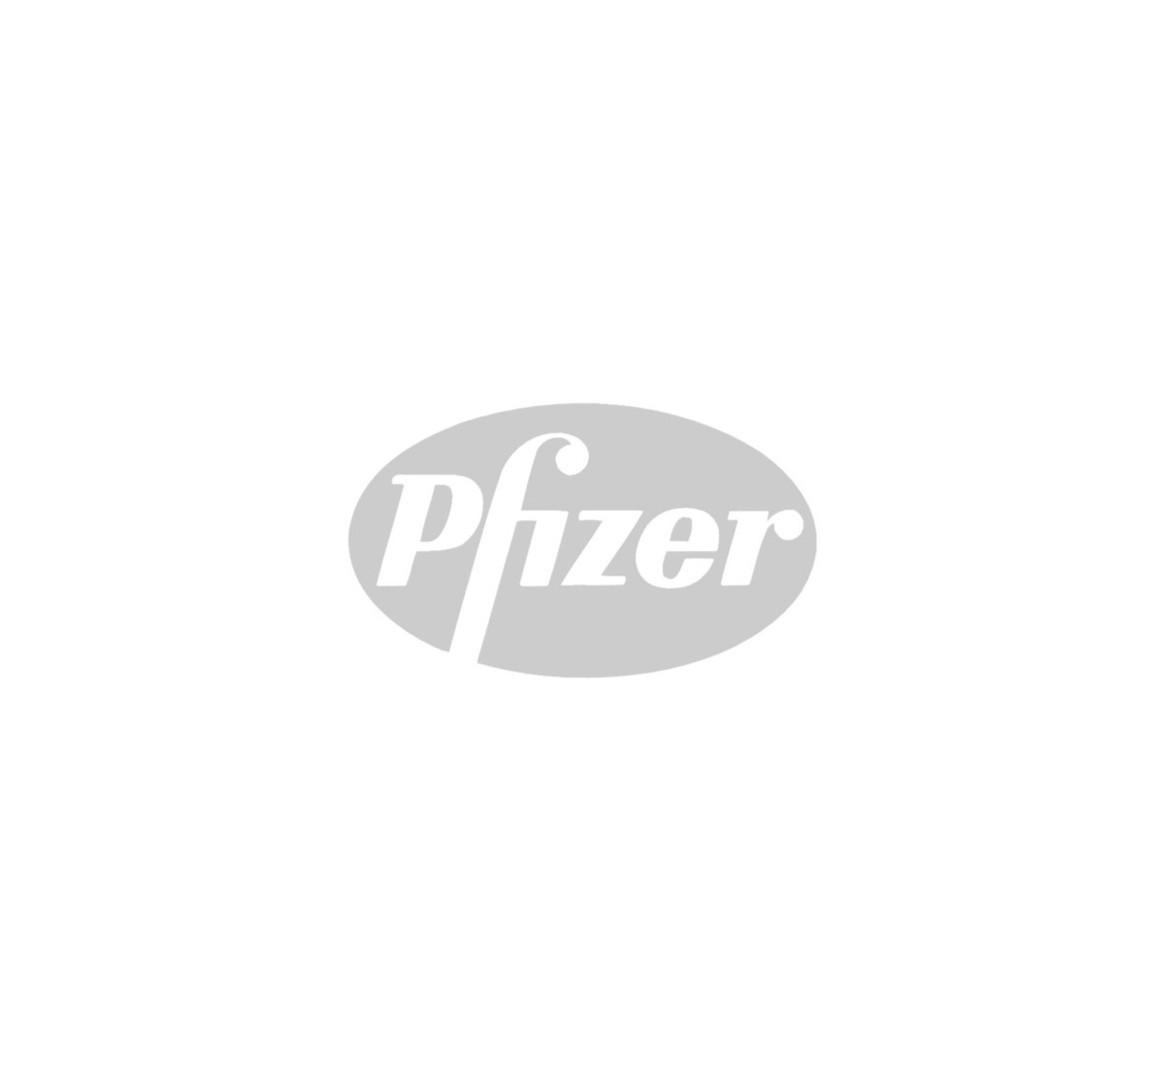 Pfizer_edited_edited.jpg